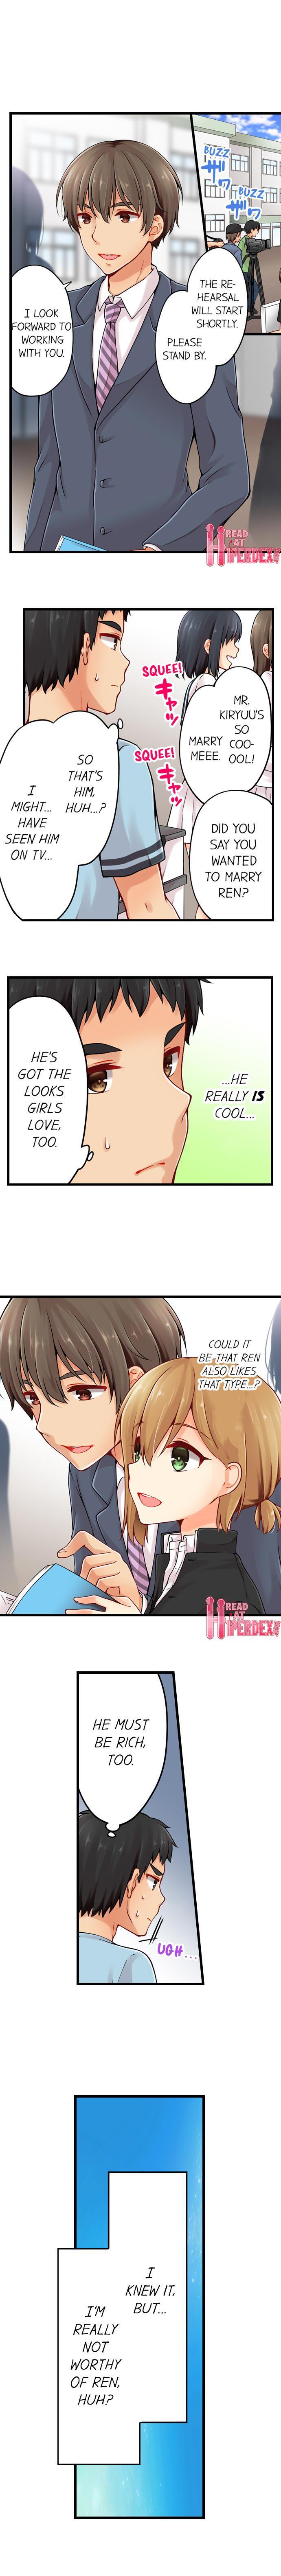 Ren Arisugawa Is Actually A Girl 454